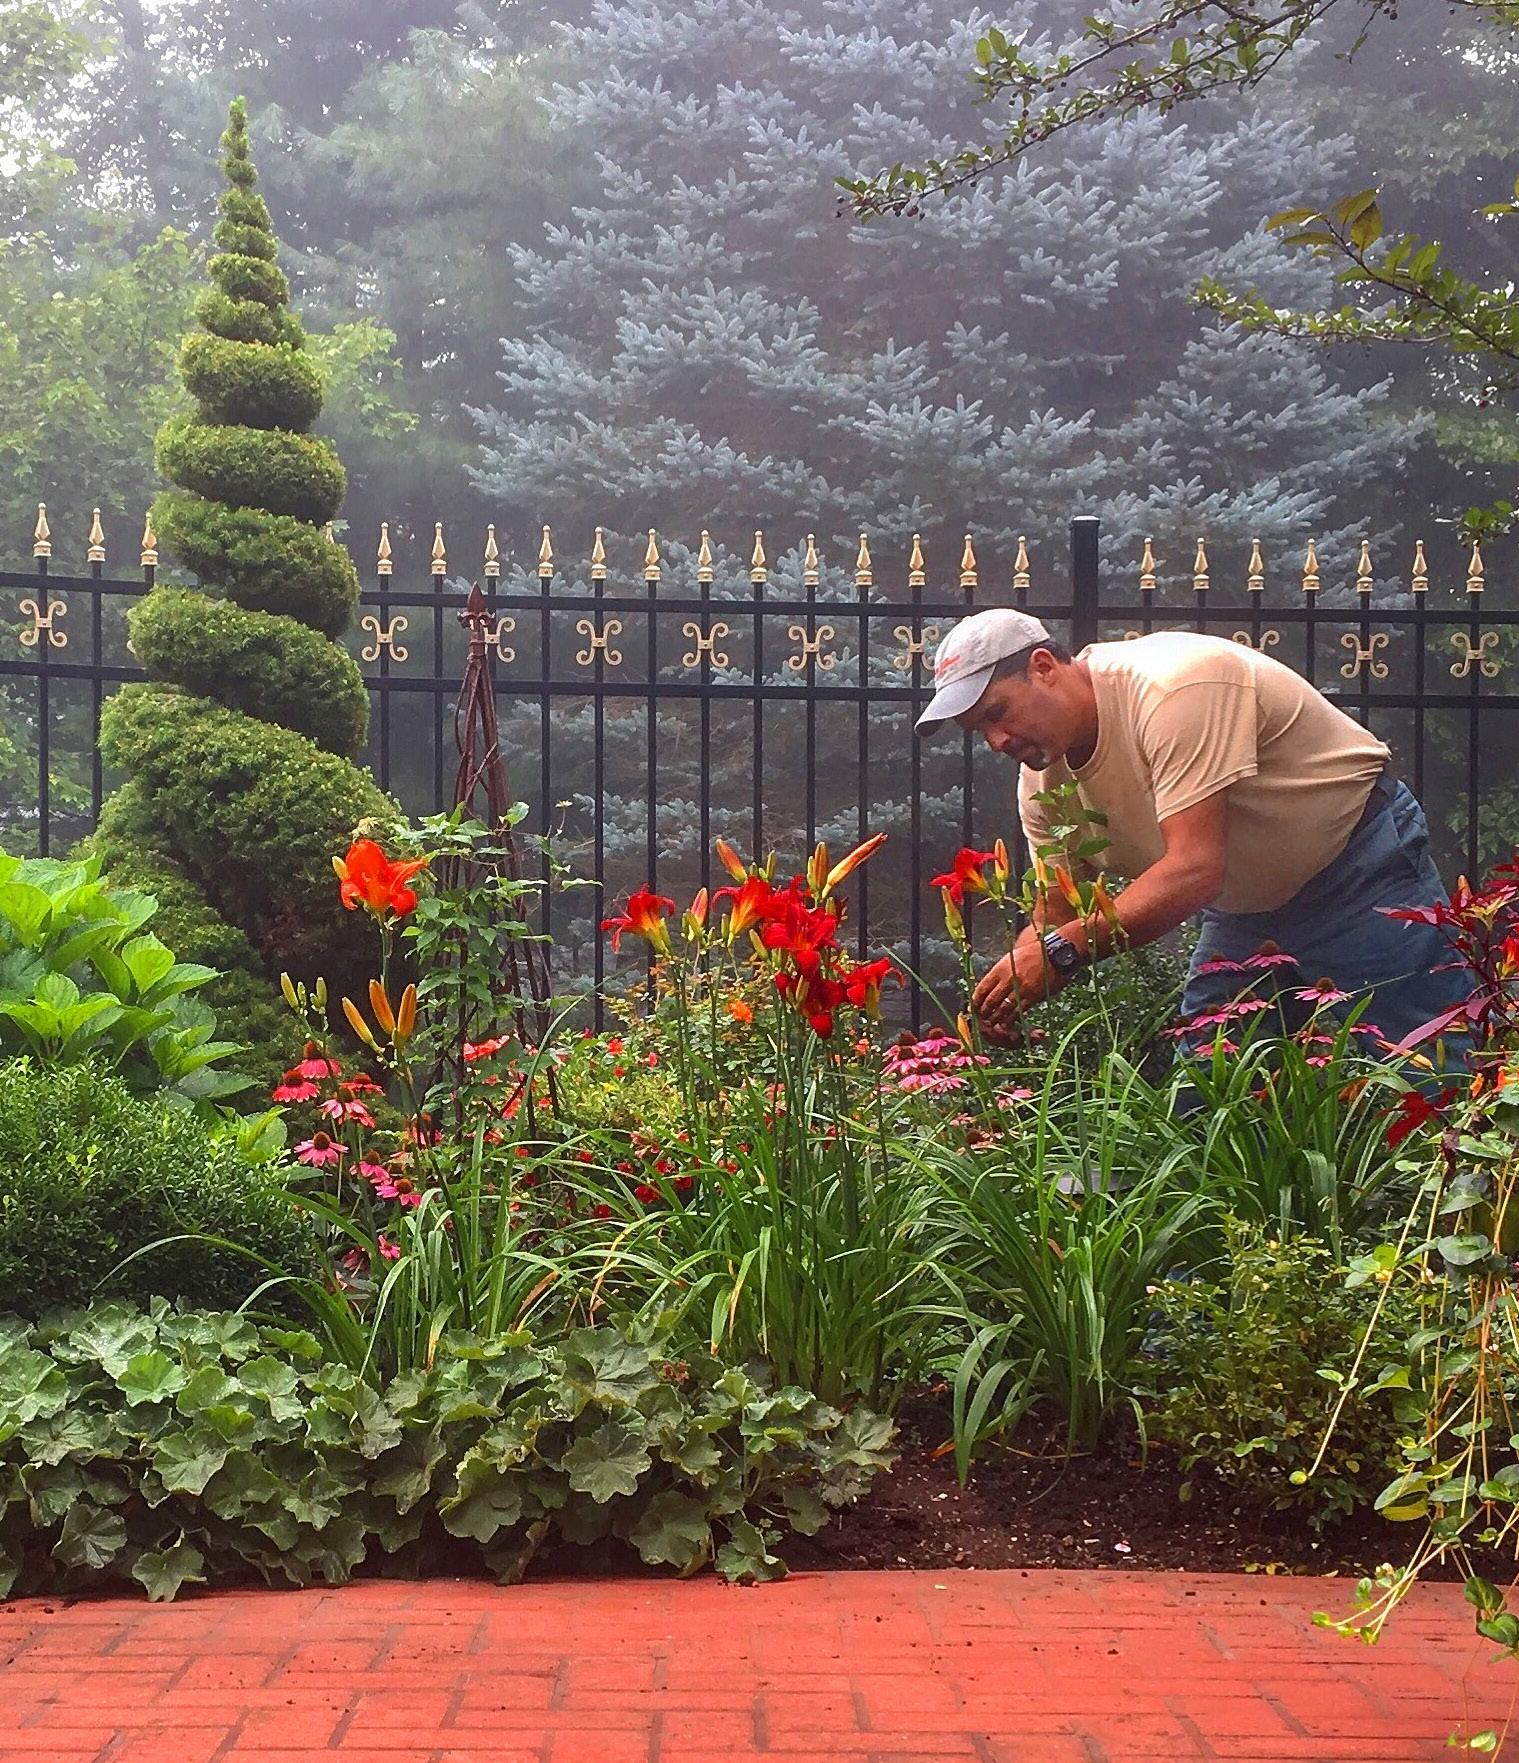 Paul Camara maintaining flowers